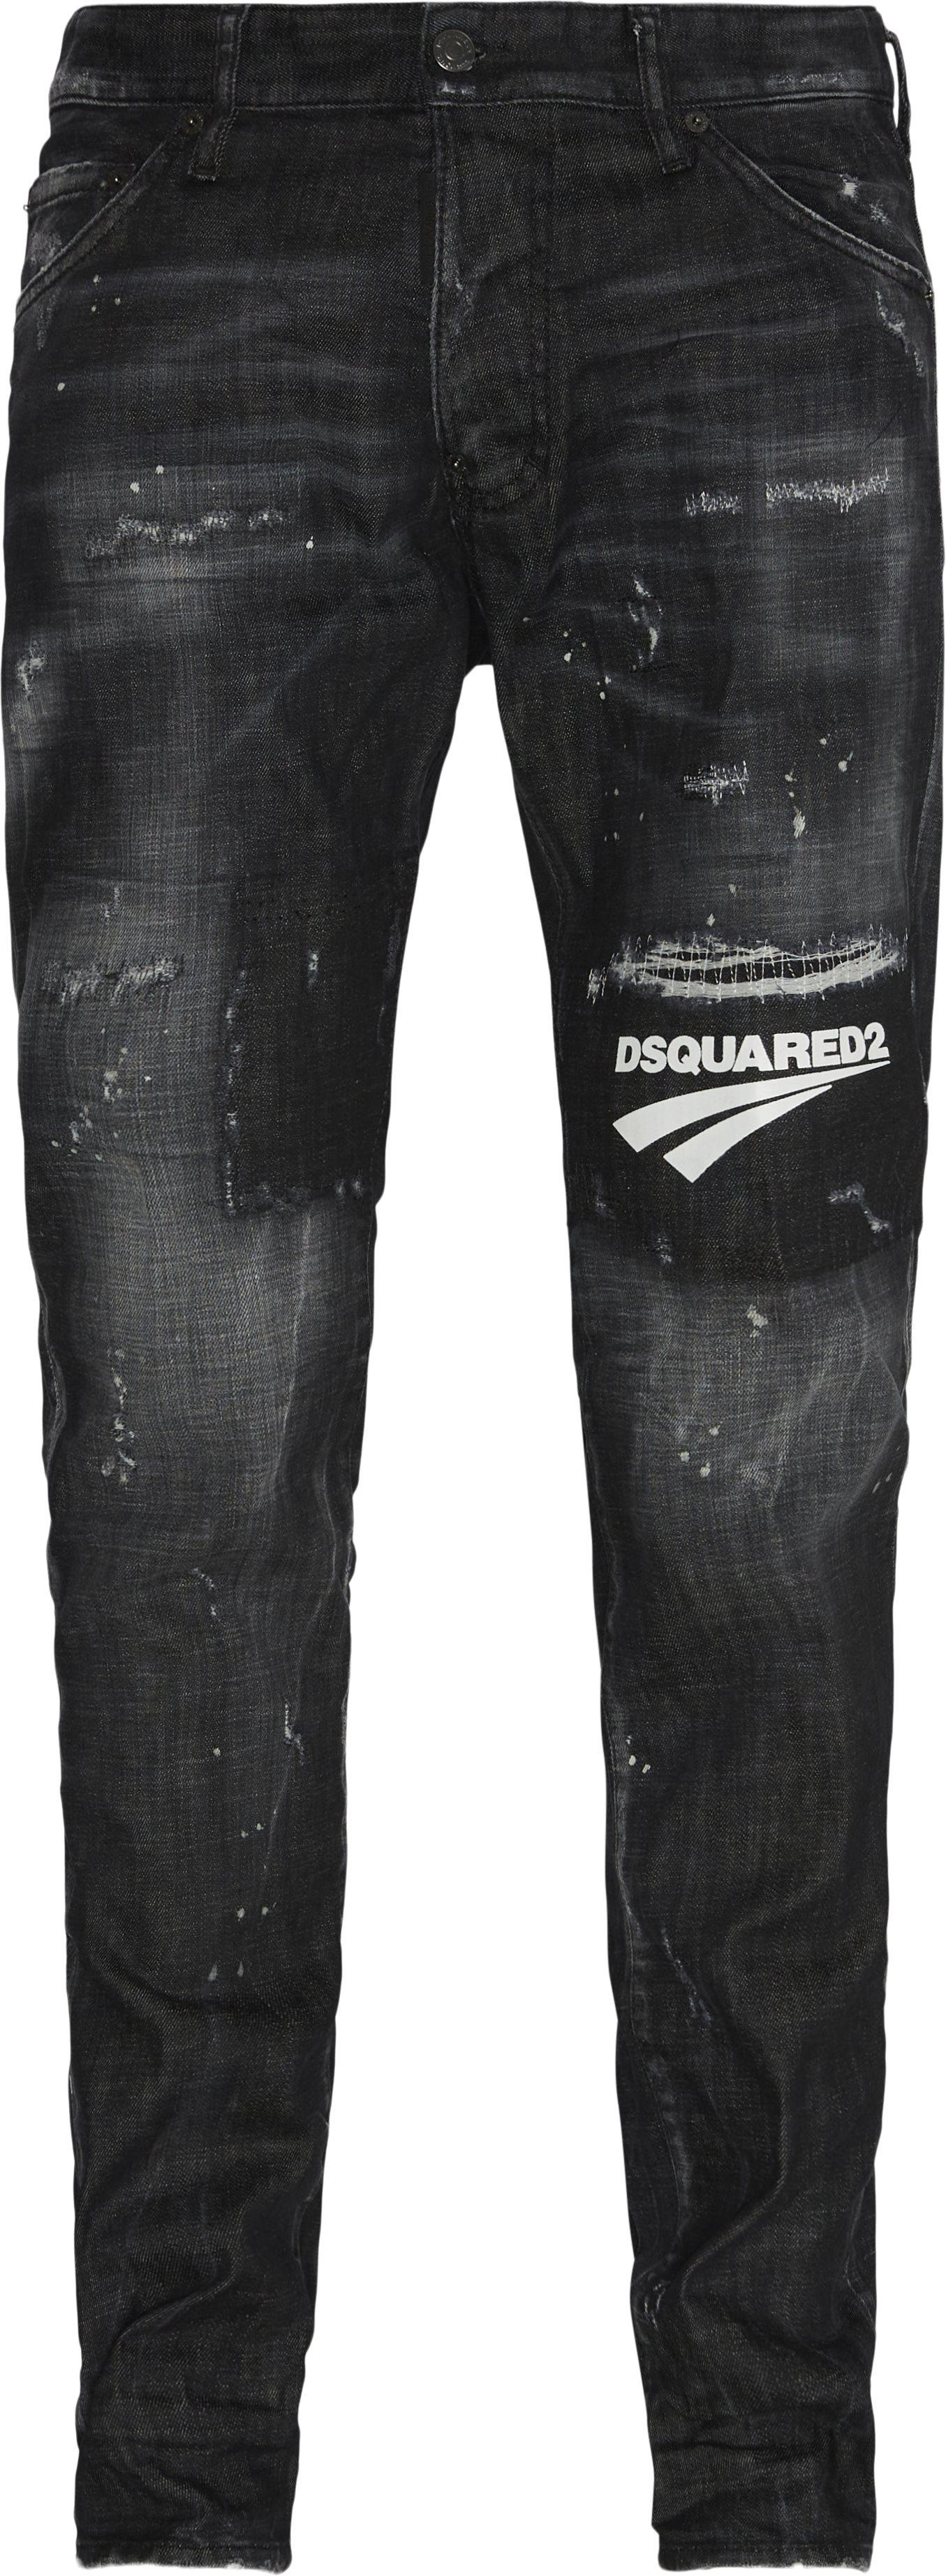 Broken Logo Jeans - Jeans - Sort